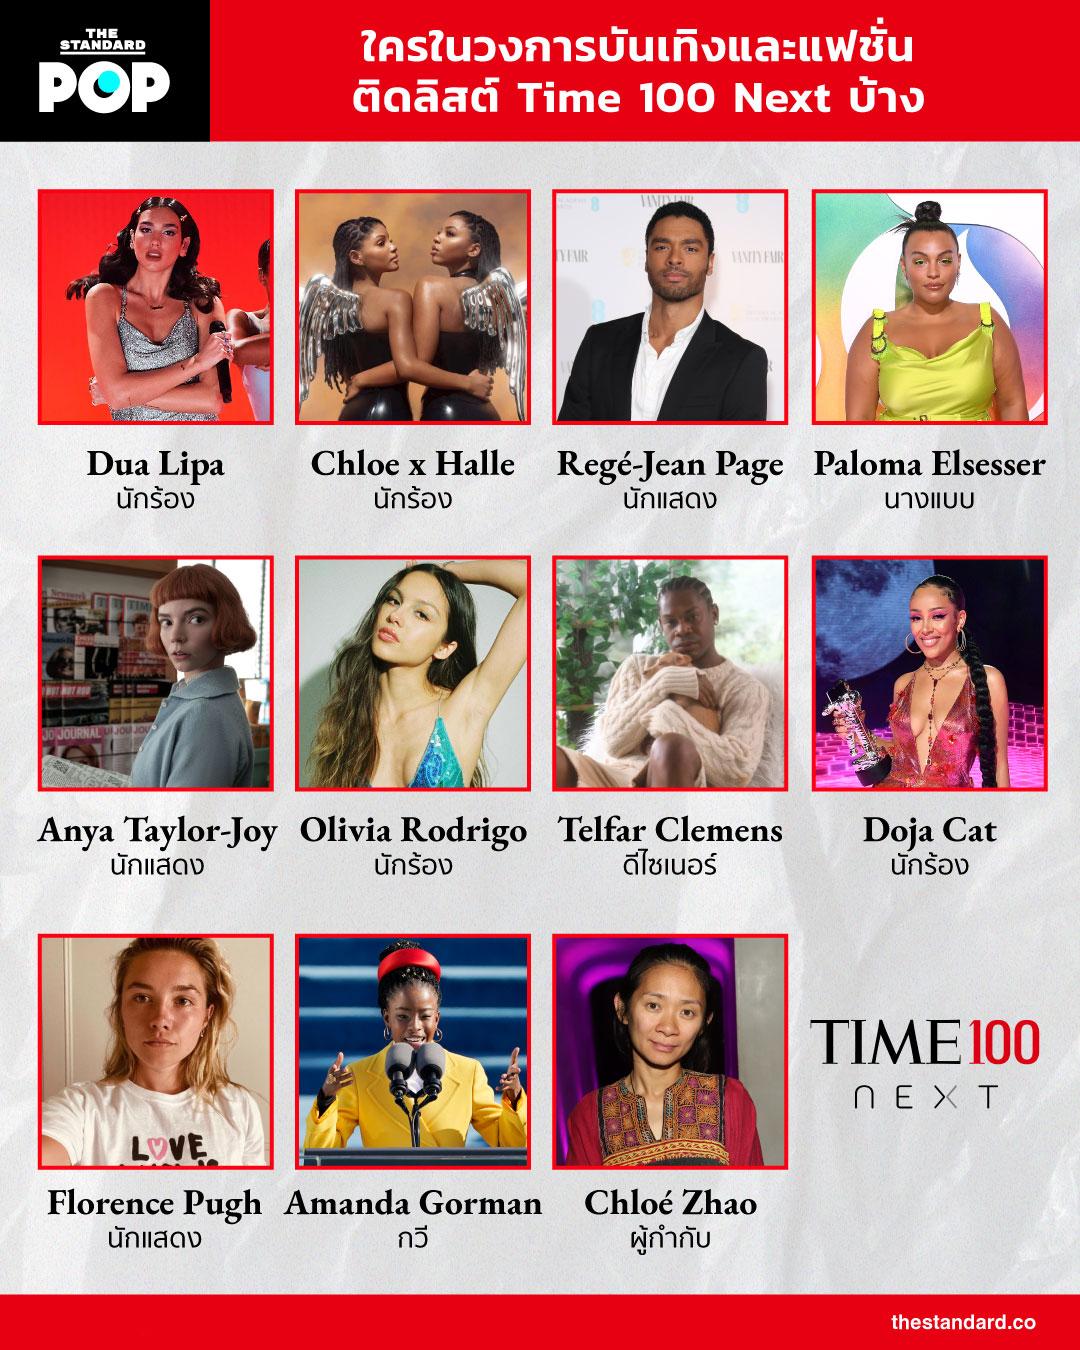 Time 100 Next